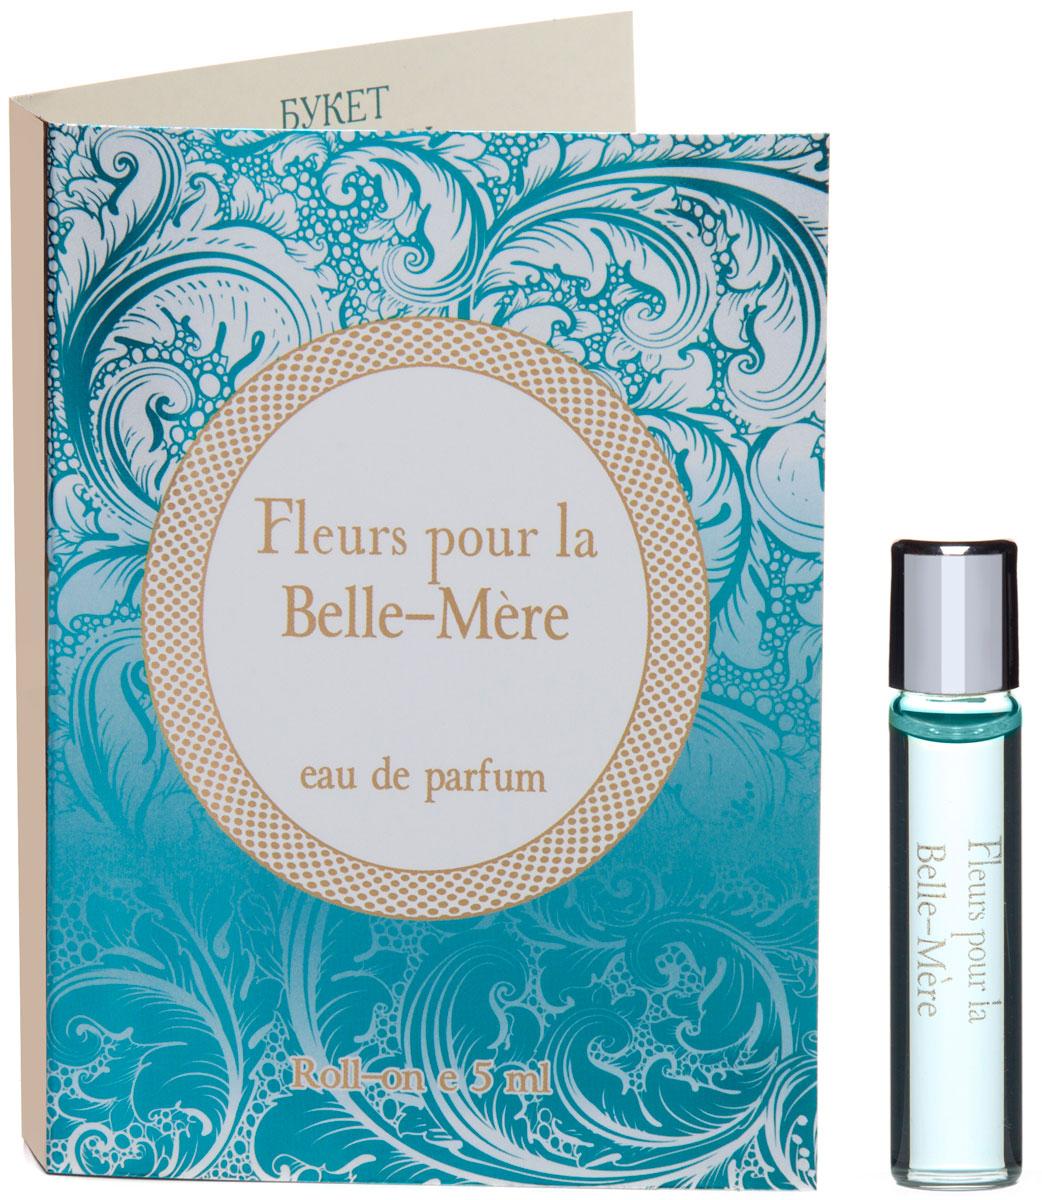 Sergio Nero Fleurs pour la Belle-Mere женская, 5 мл 5 мл sergio nero wedding fleurs pour la belle mere парфюмерная вода для женщин 50 мл